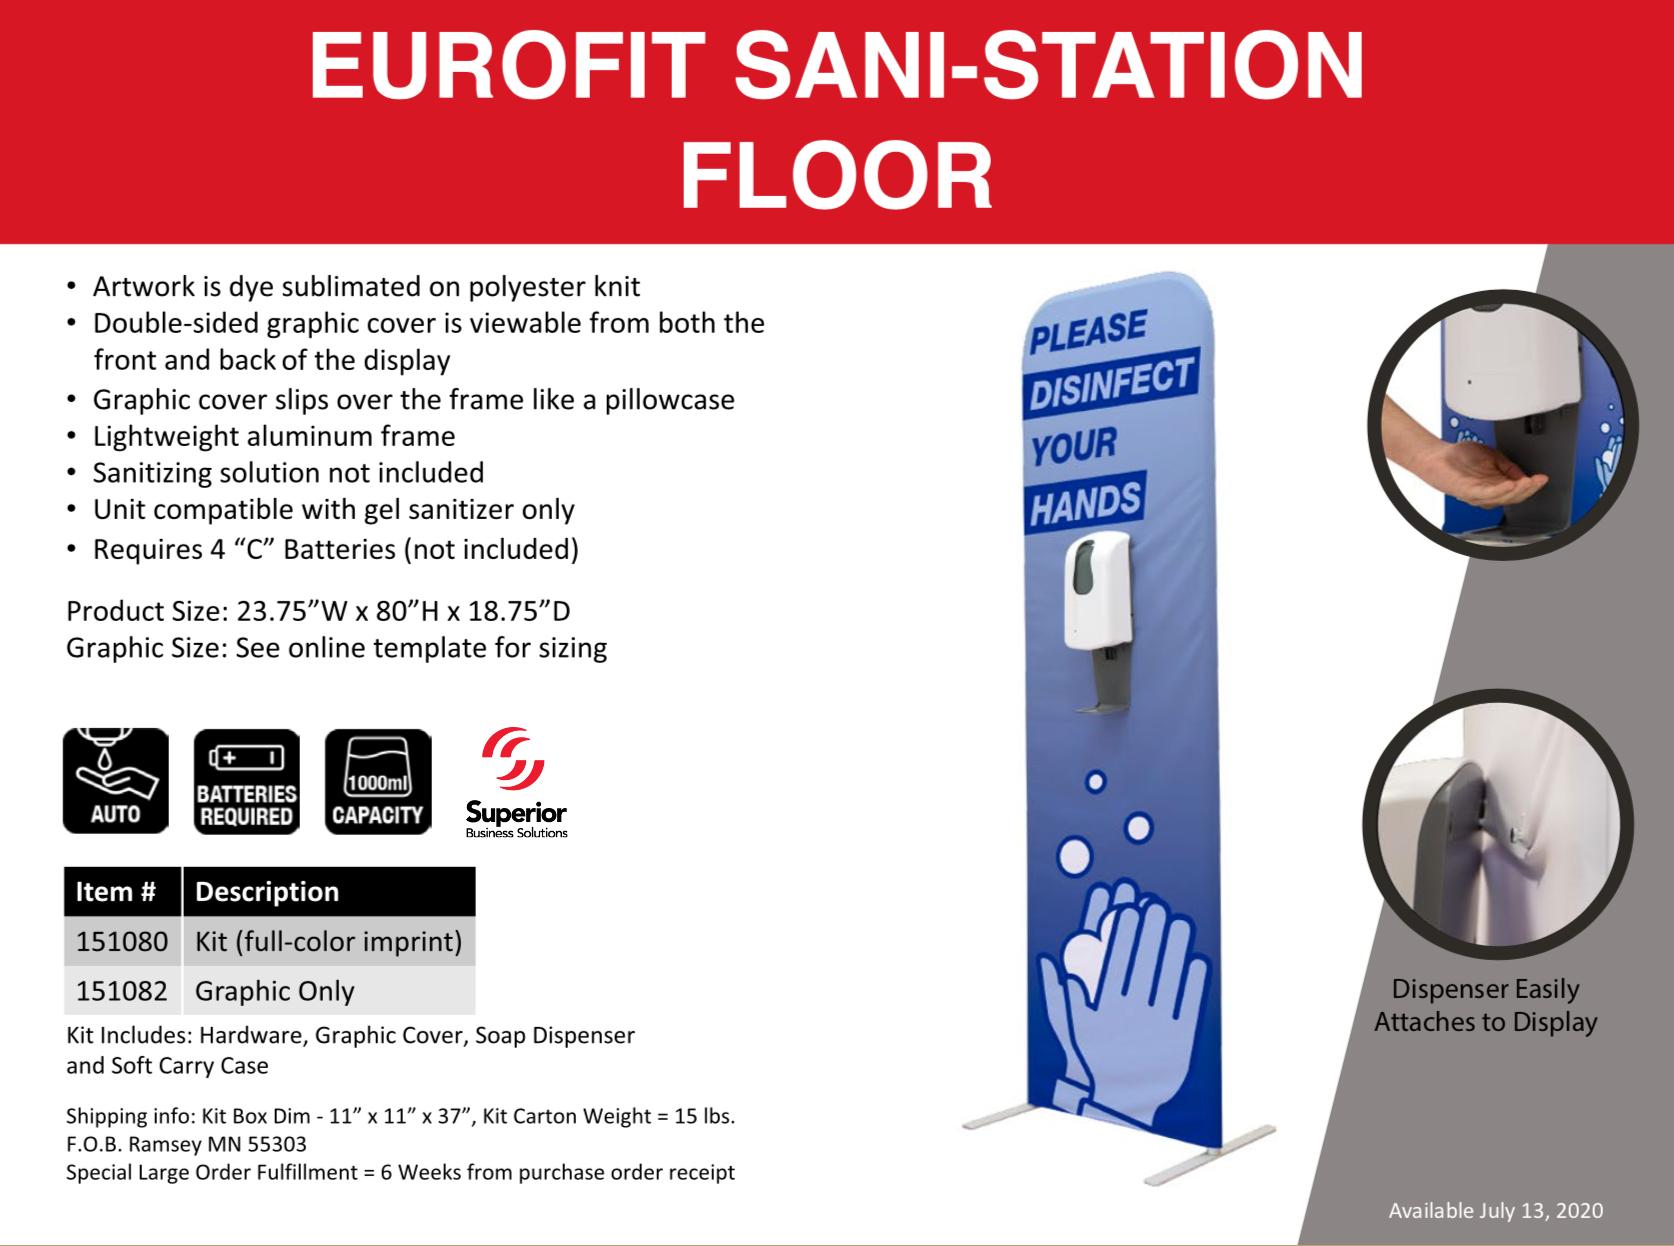 eurofit-sani-station-floor-model